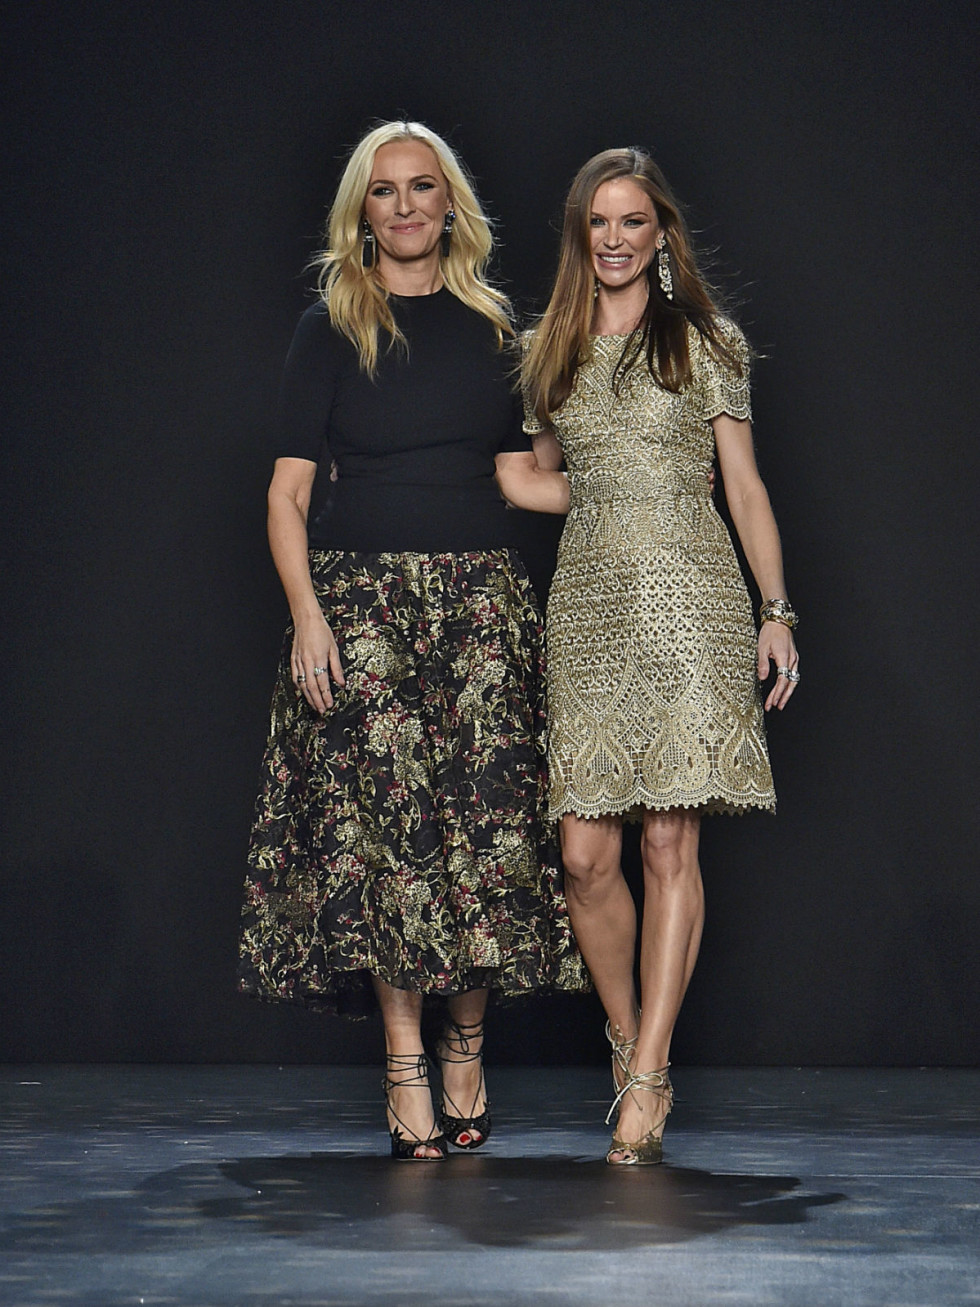 Marchesa designers Keren Craig and Georgina Chapman